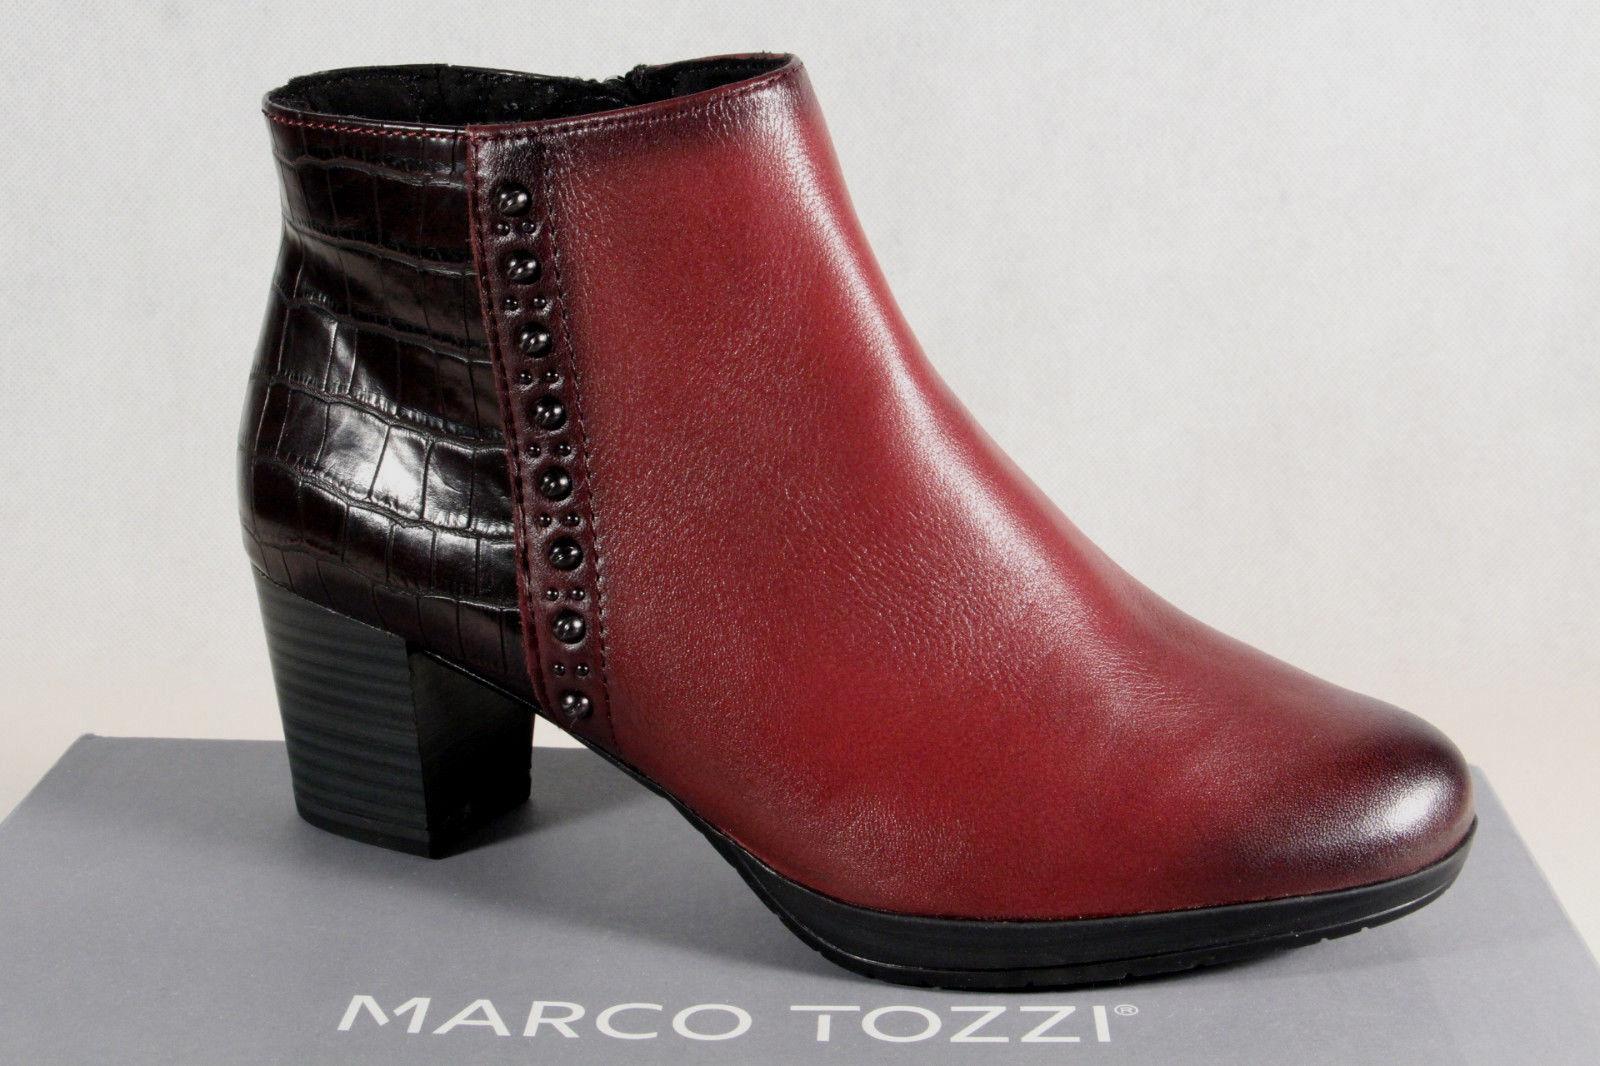 Marco Tozzi Stiefelette Stiefel Reißverschluß gefüttert 25388 Echtleder NEU